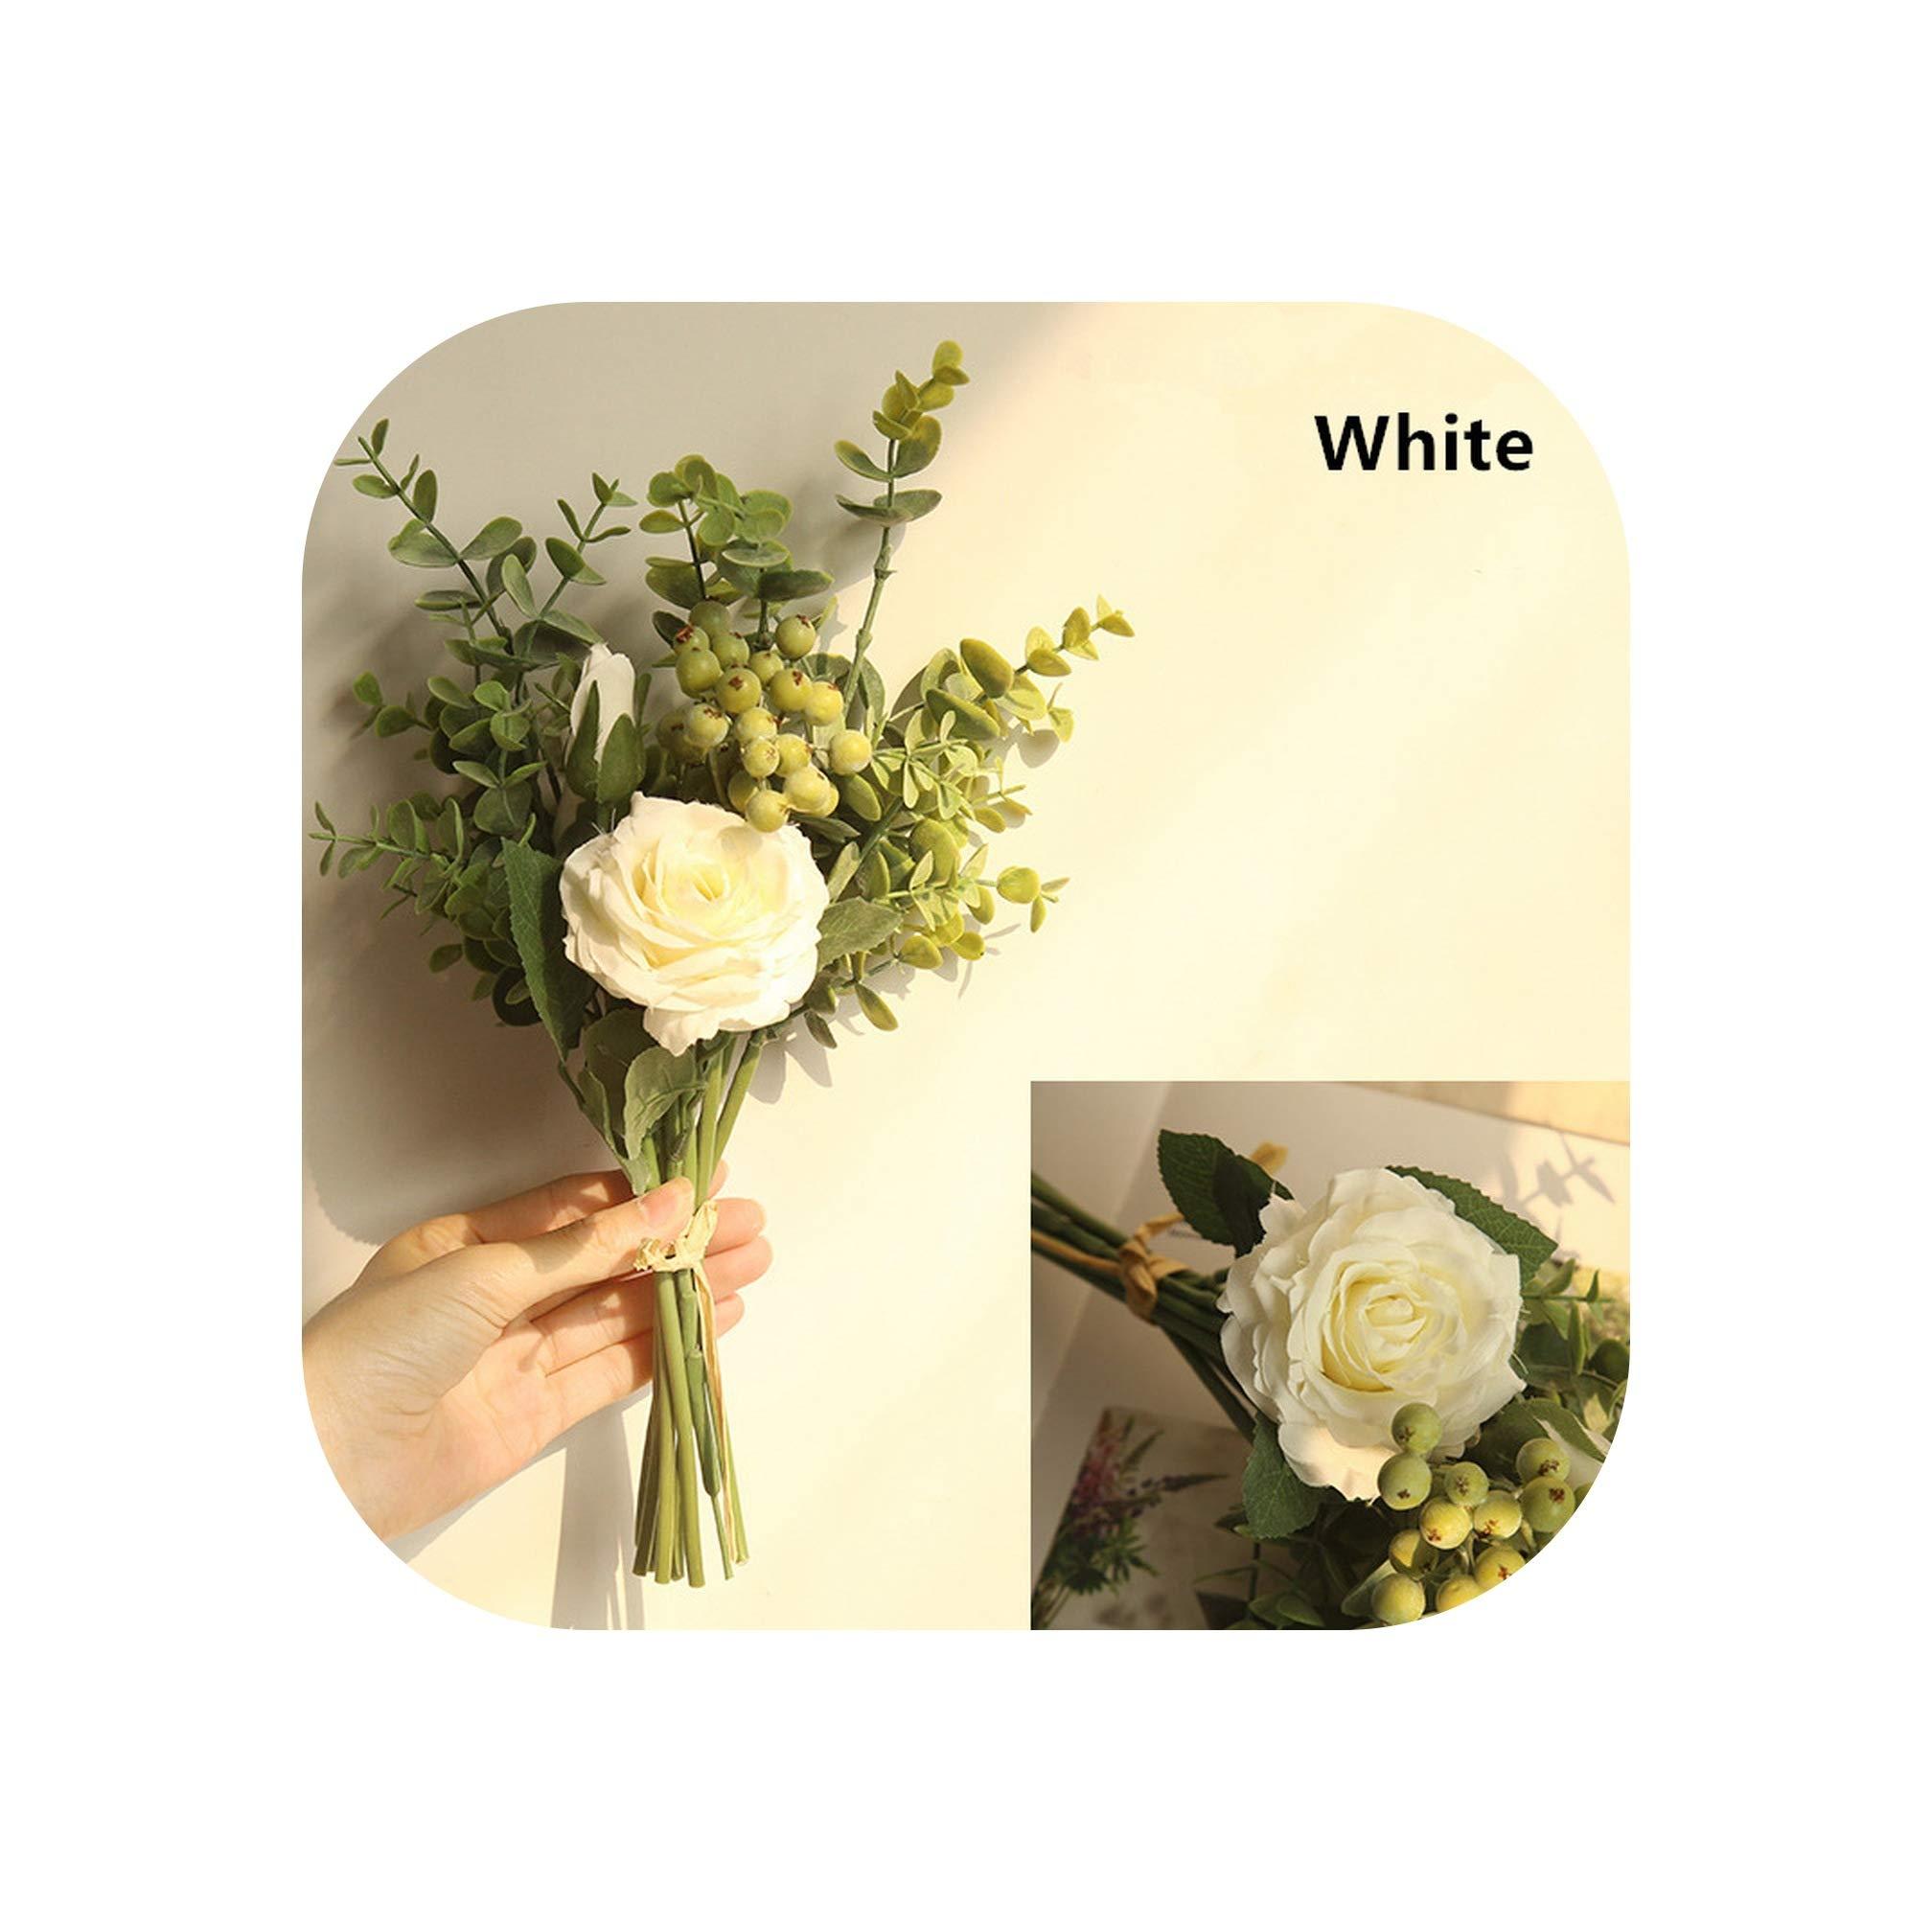 Bridal-Rose-Wedding-Bouquet-Bridesmaid-Peony-Eucalyptus-Leaves-Bouquets-Artificial-Silk-Flowers-ArrangementSmall-White